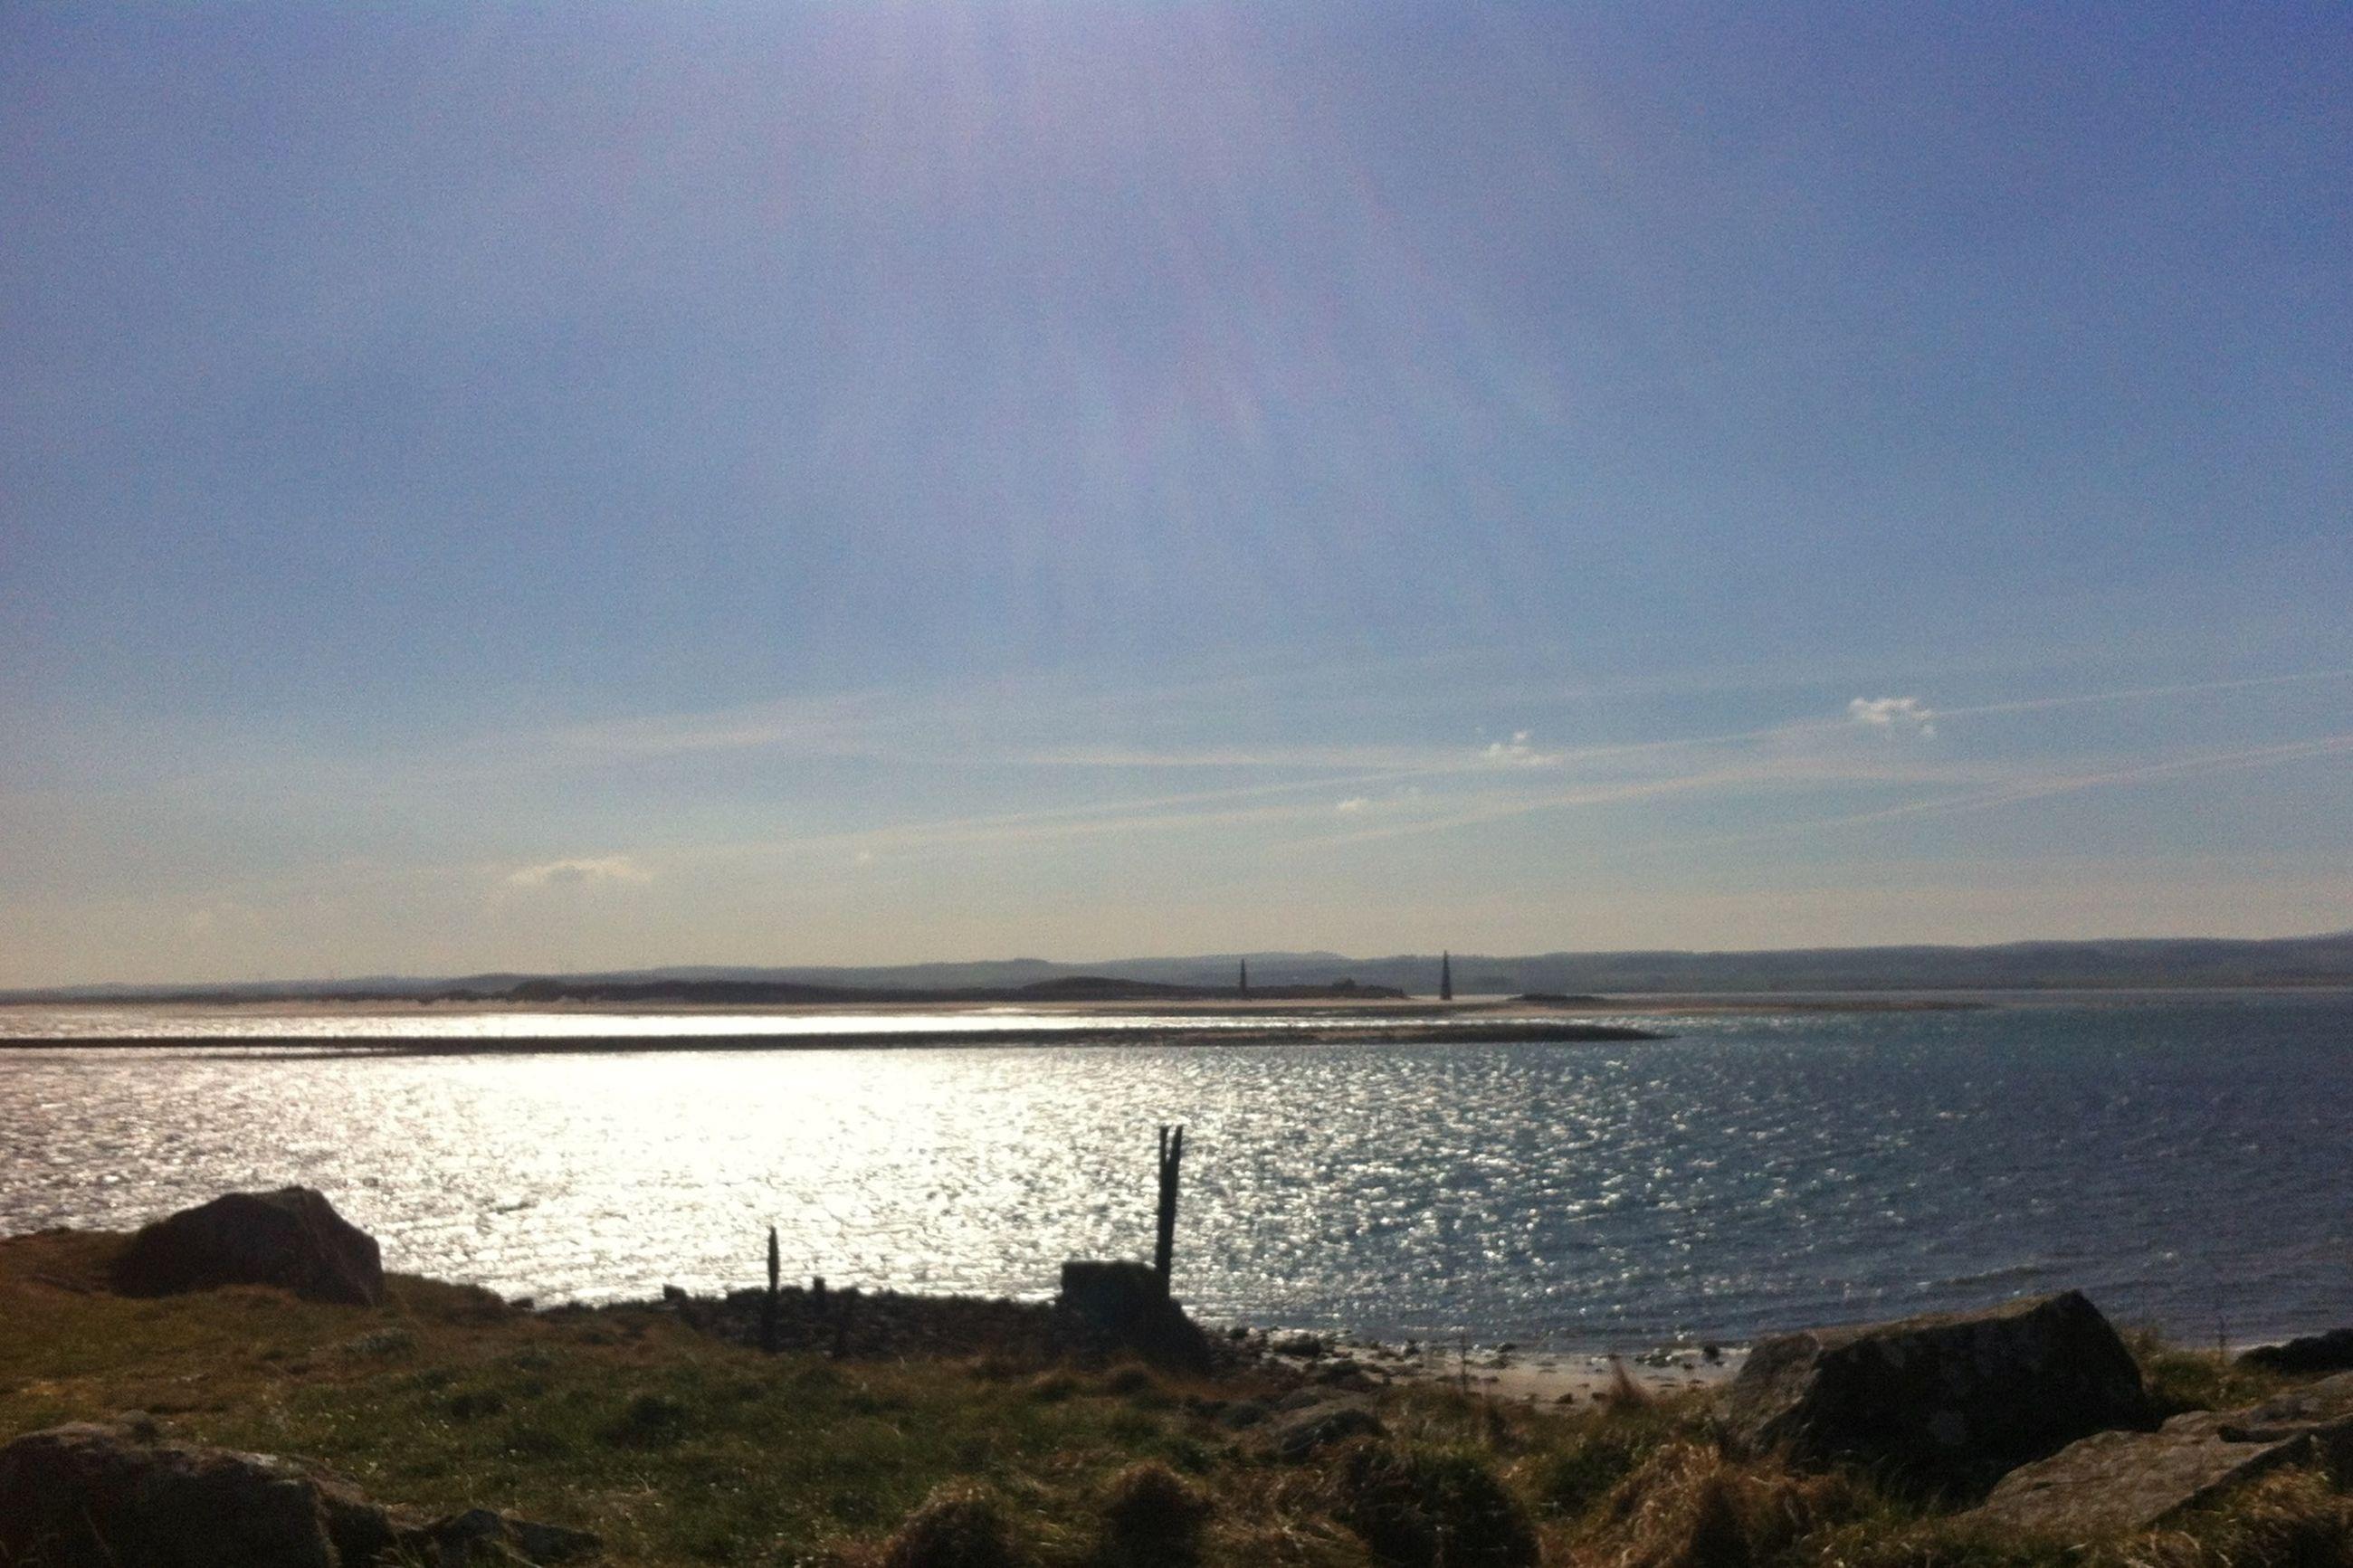 sea, water, horizon over water, tranquil scene, tranquility, scenics, sky, beauty in nature, nature, shore, idyllic, beach, rock - object, remote, outdoors, calm, non-urban scene, coastline, no people, cloud - sky